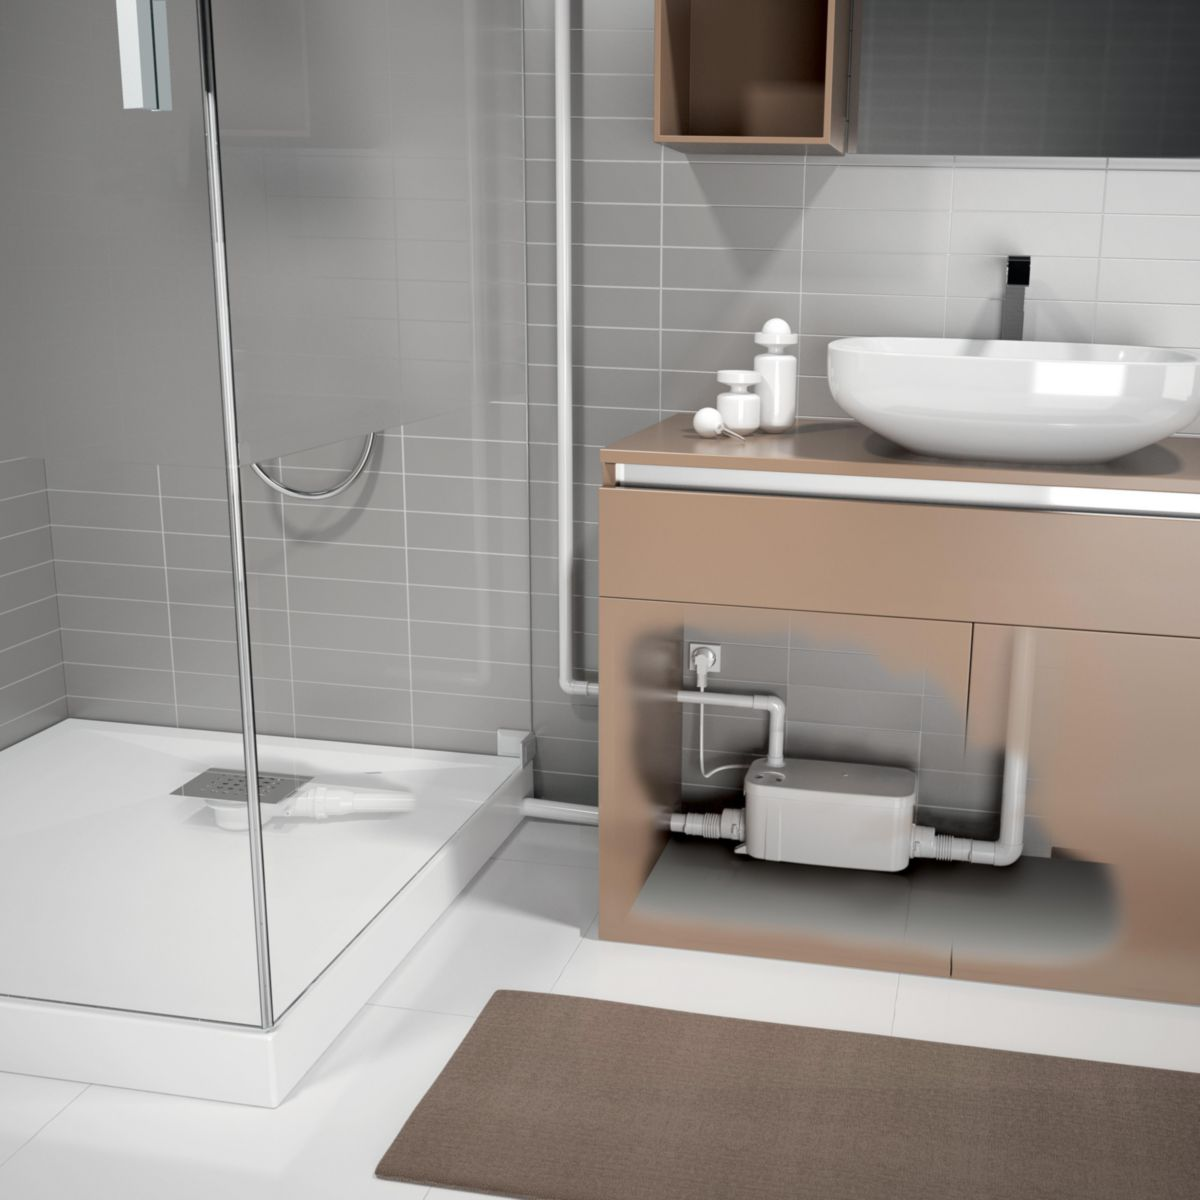 pompe de relevage douche vd90 r f kinpompe06 kinedo douche. Black Bedroom Furniture Sets. Home Design Ideas